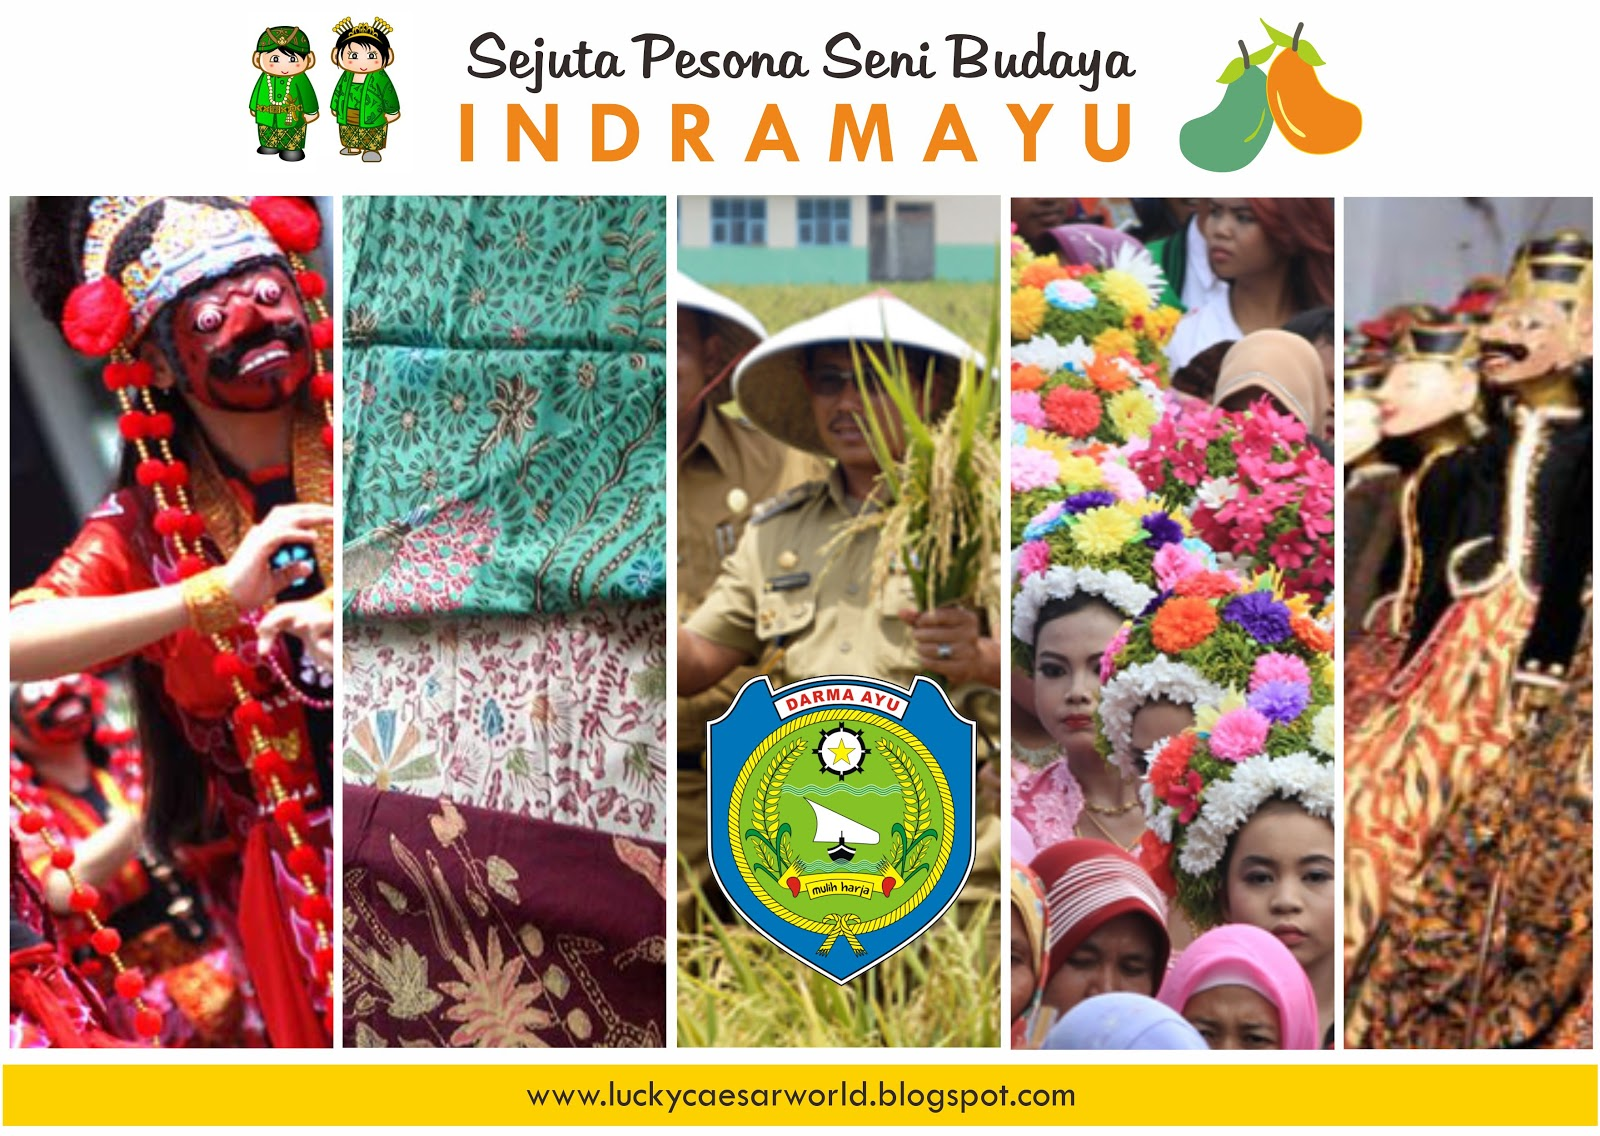 Kontemplasi Asa Akulturasi Budaya Jawa Sunda Indramayu